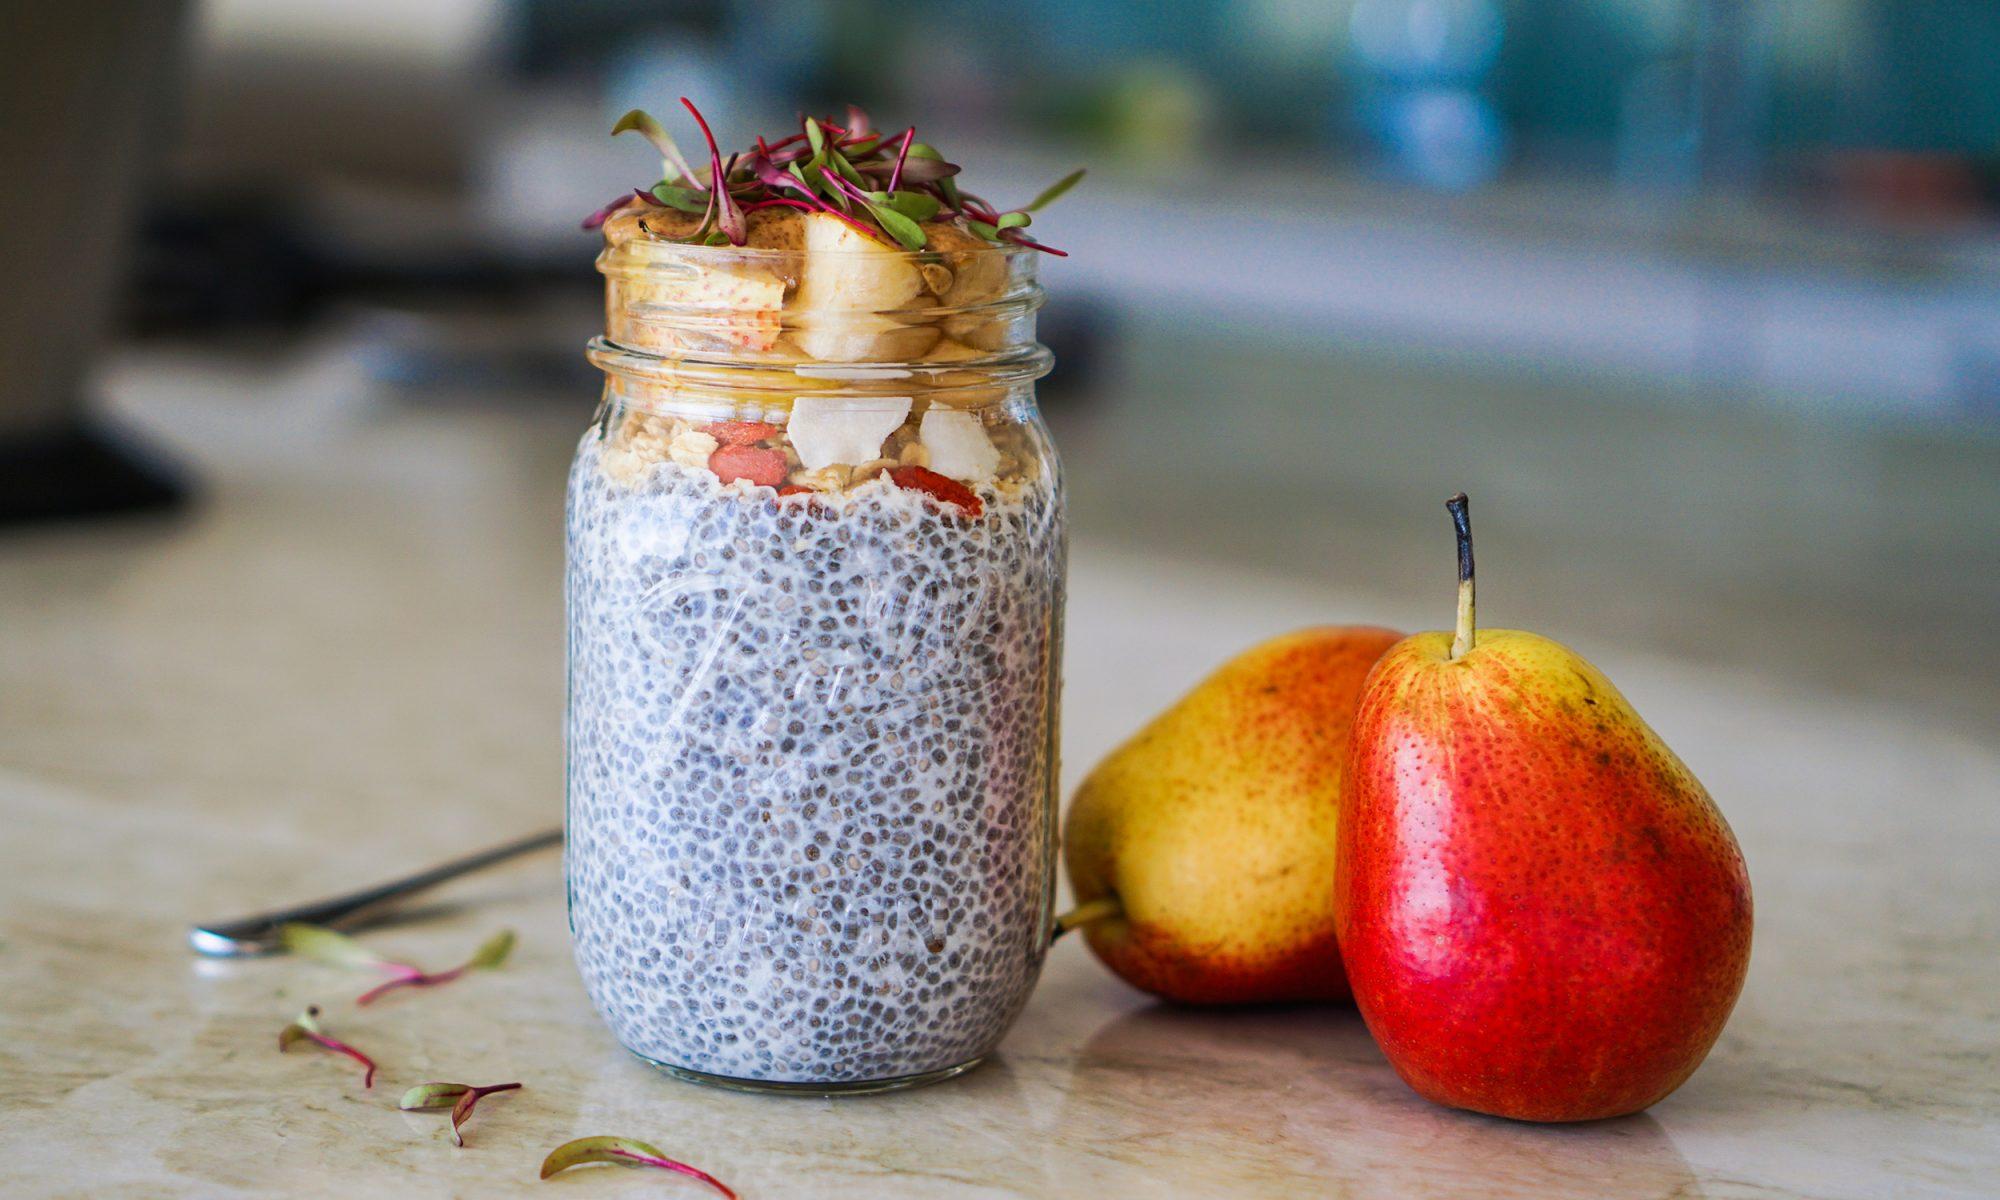 EC: Mason Jar Breakfasts Are the Best